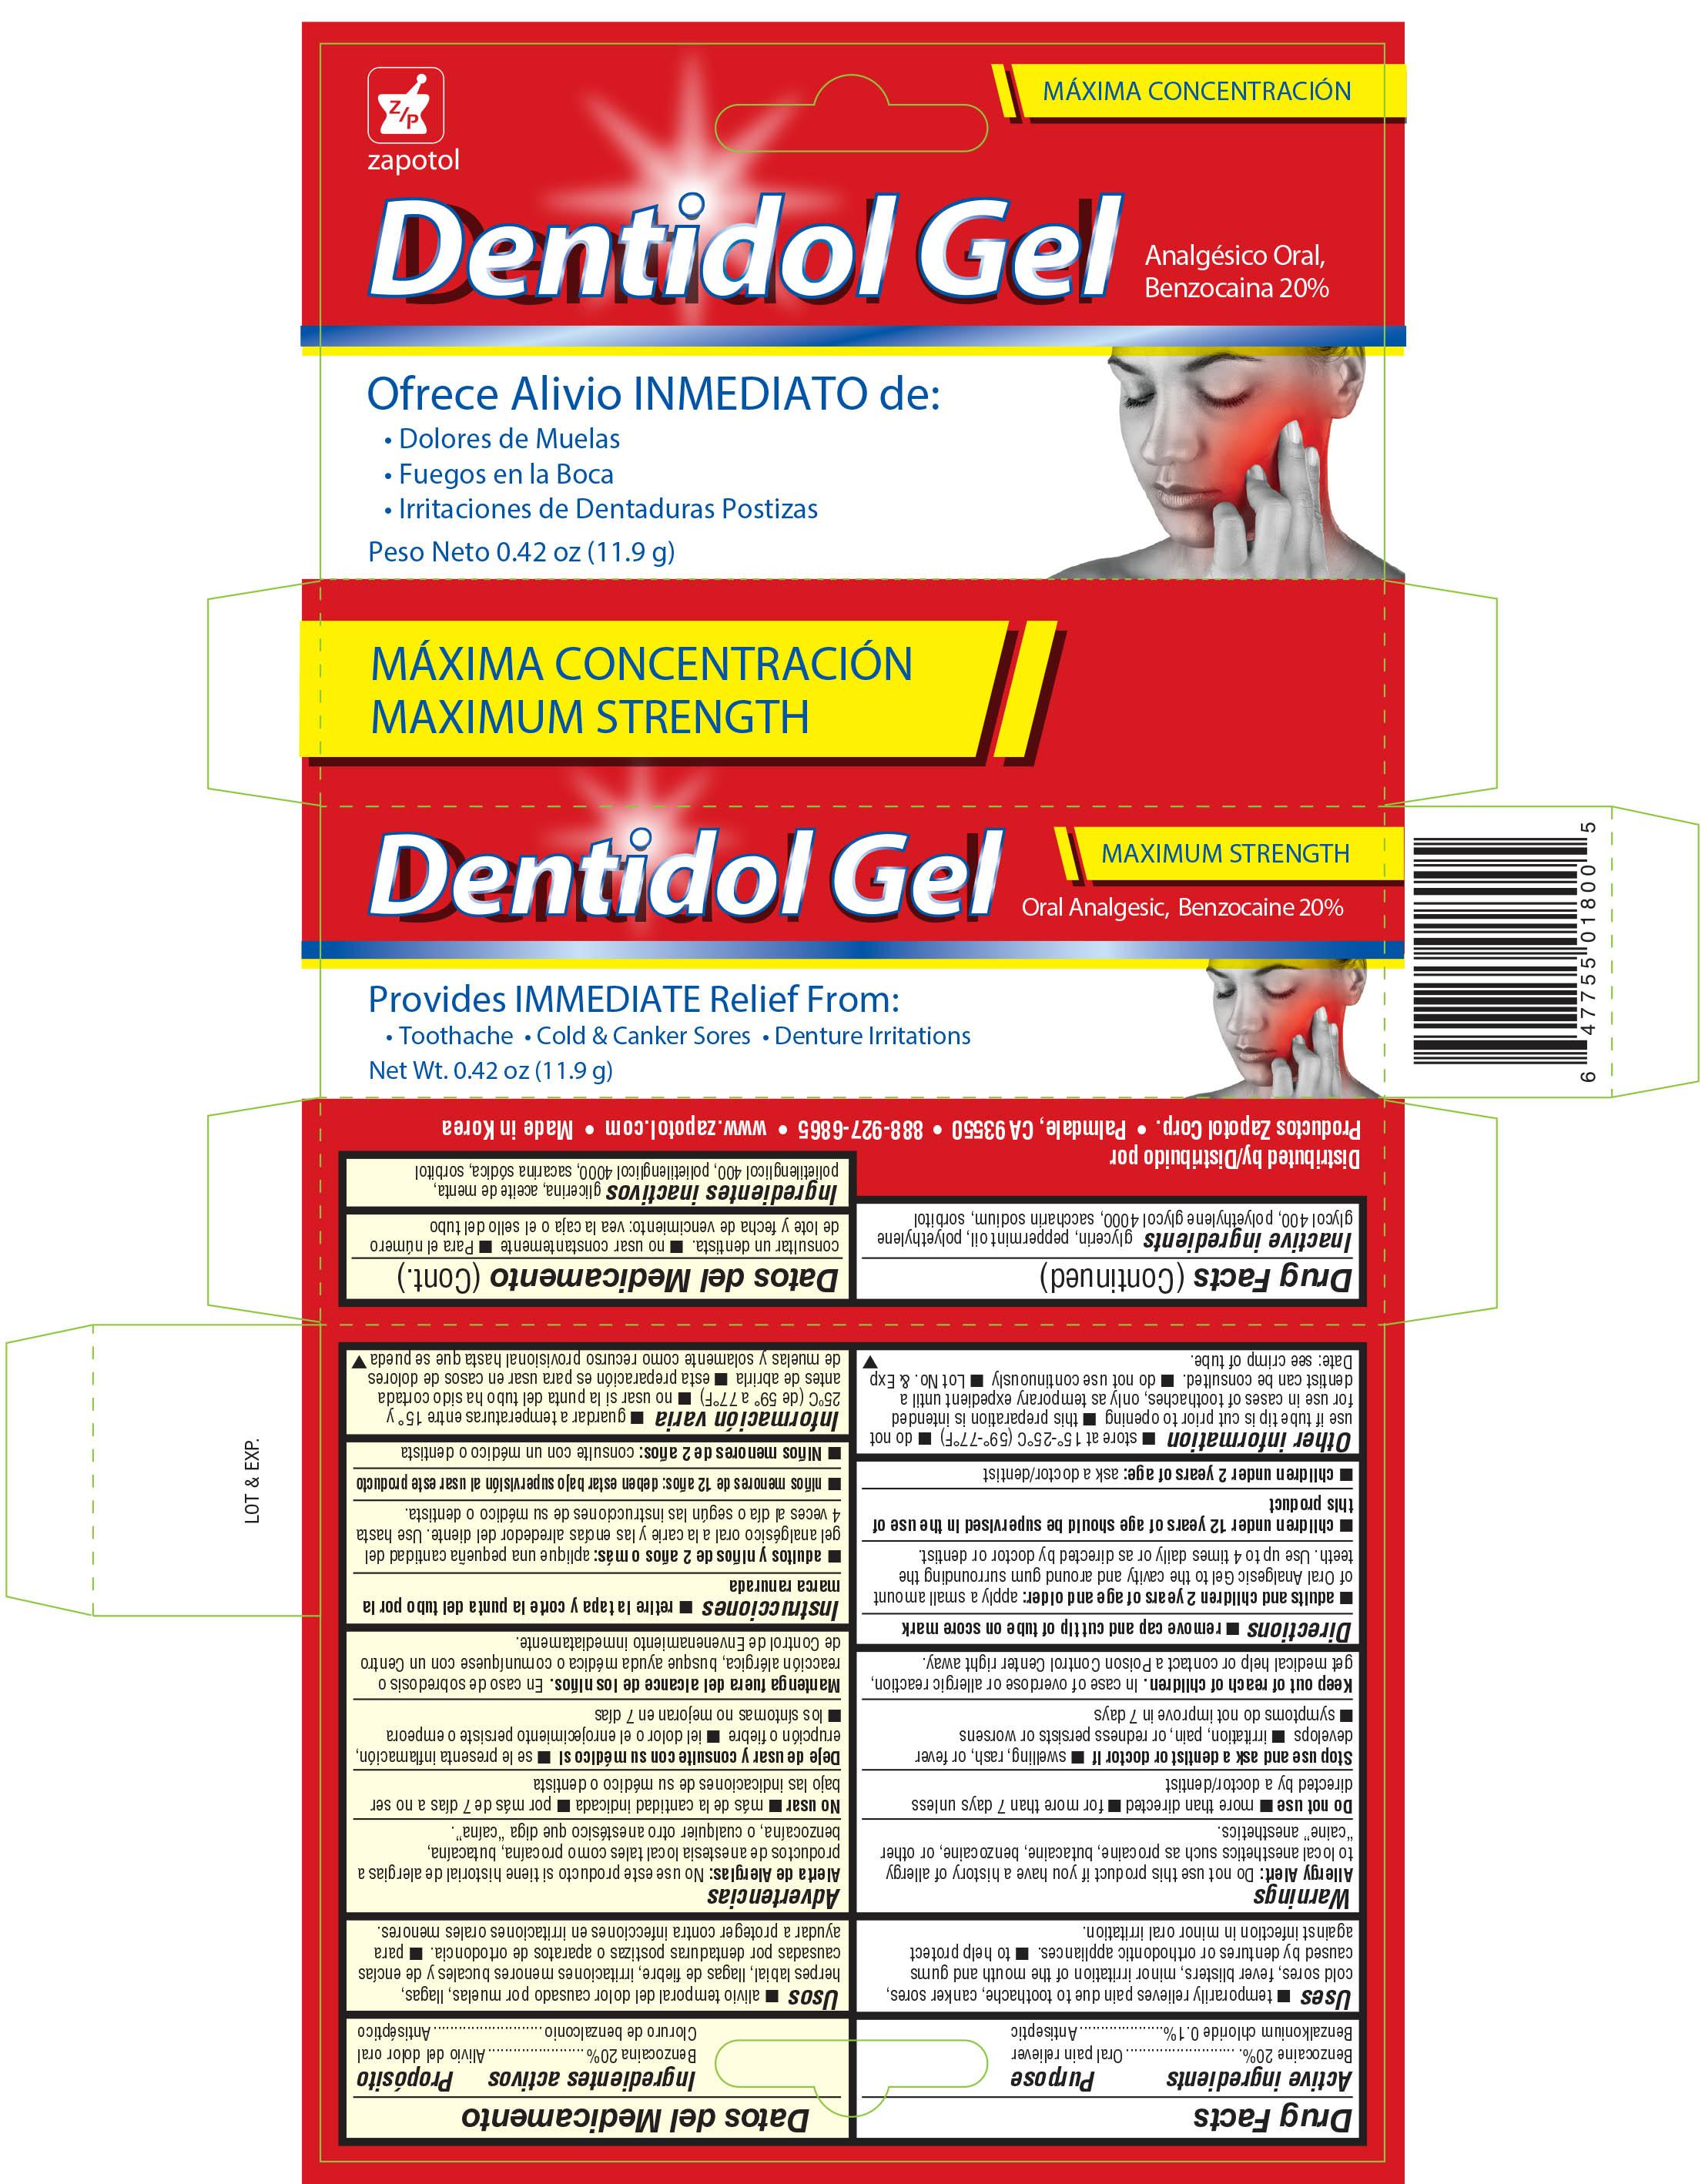 Zapotol Dentidol Oral Analgesic (Benzocaine, And Benzalkonium Chloride) Gel [Productos Zapotol Corp.]